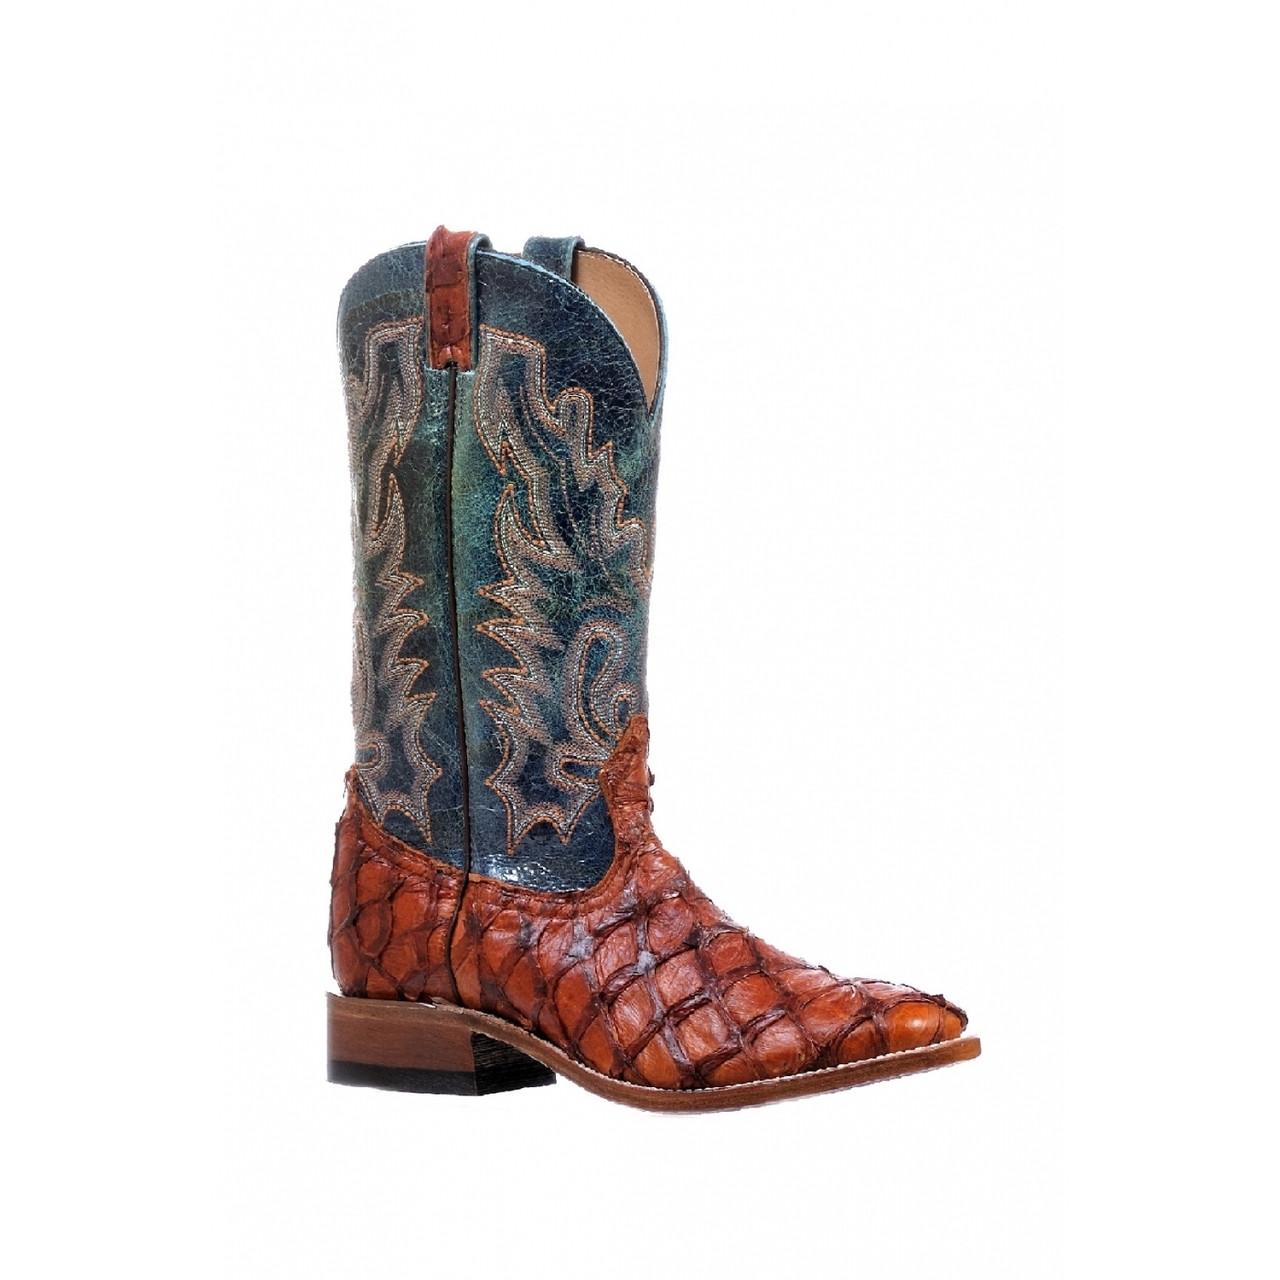 e0116645d37 Boulet Men's Western Exotic Boots - Pirarucu Fish Skin Henna Vamp